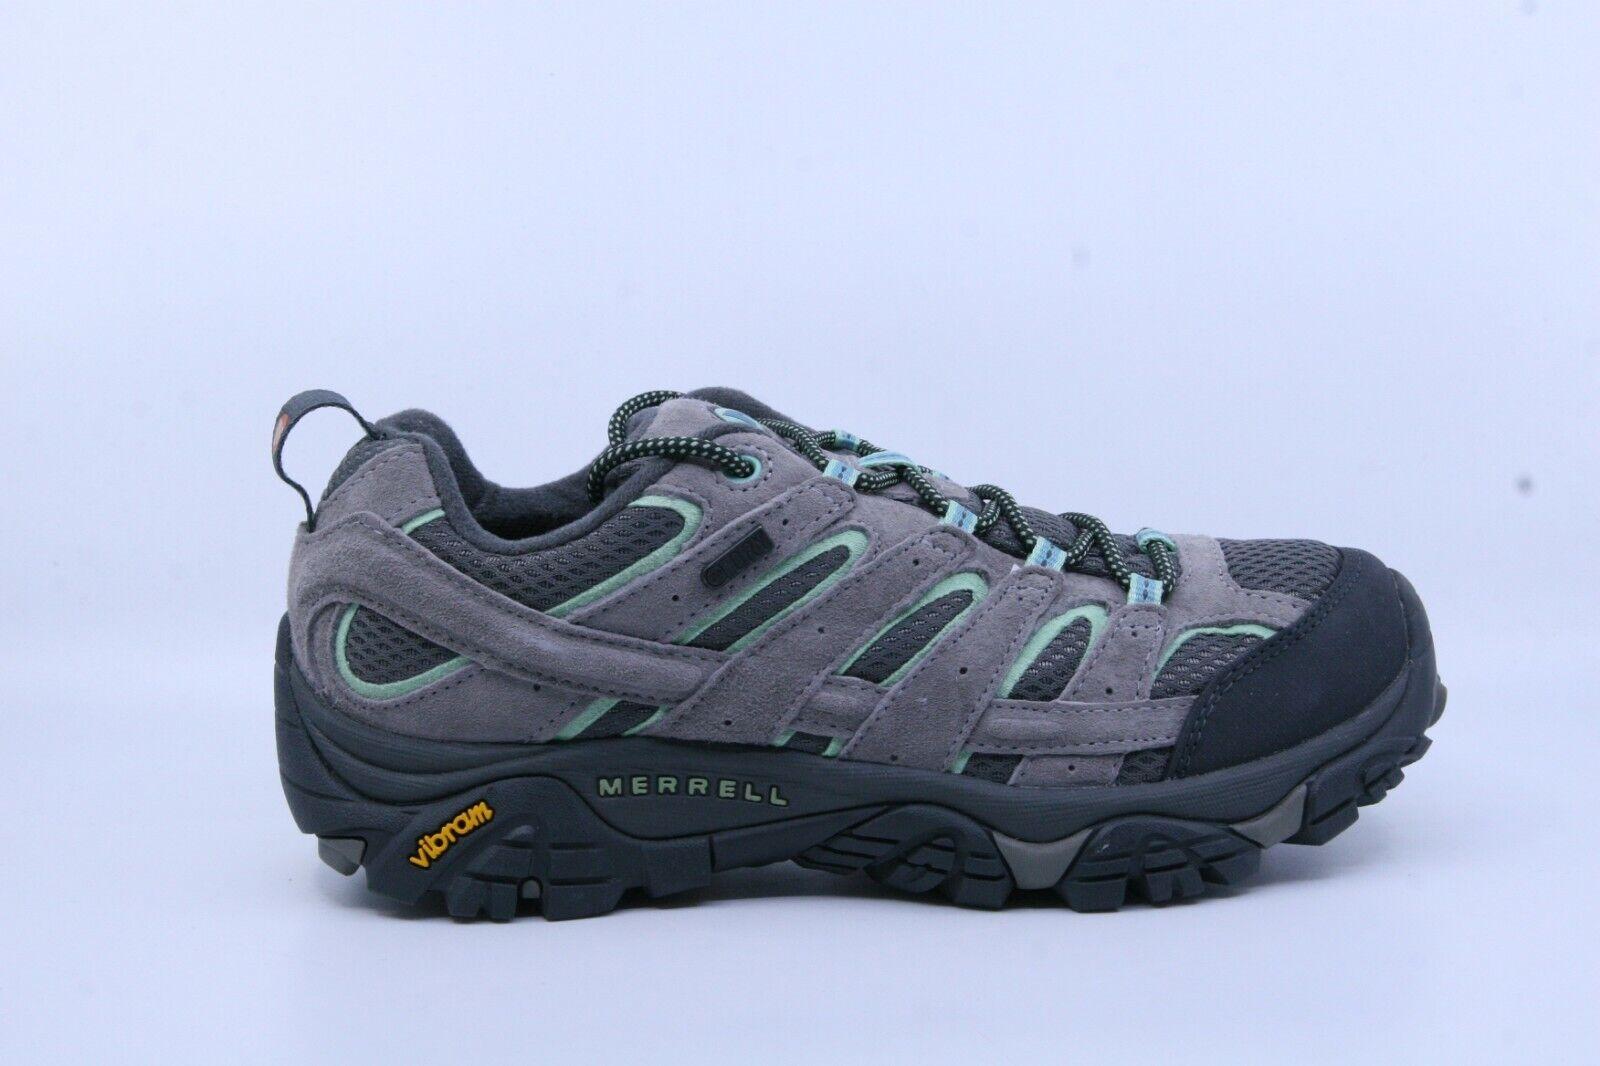 Merrell J06028 para mujer zapatos para excursionismo a prueba de agua Moab 2 llovizna menta nos 7